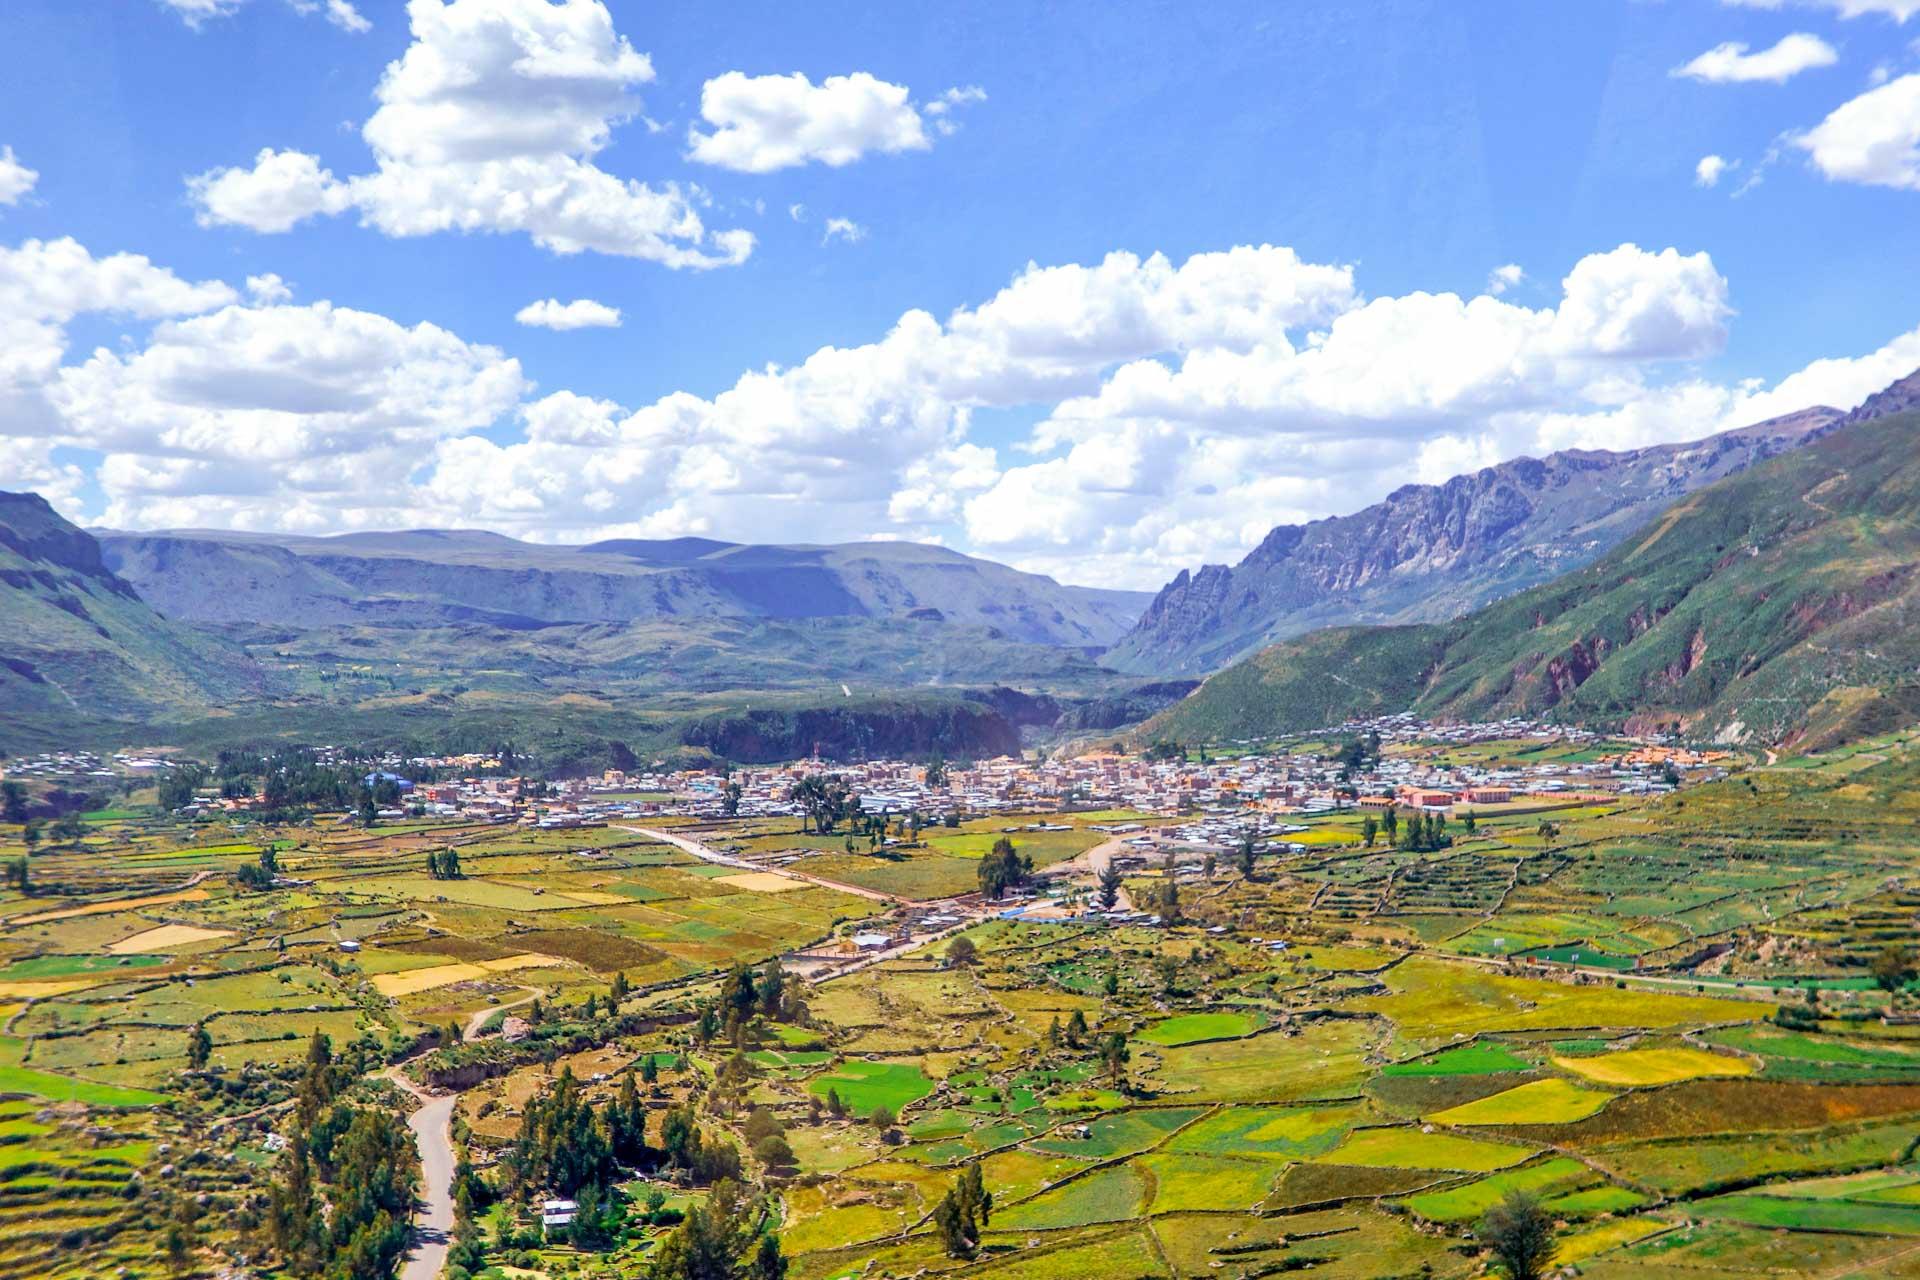 le village de Chivay